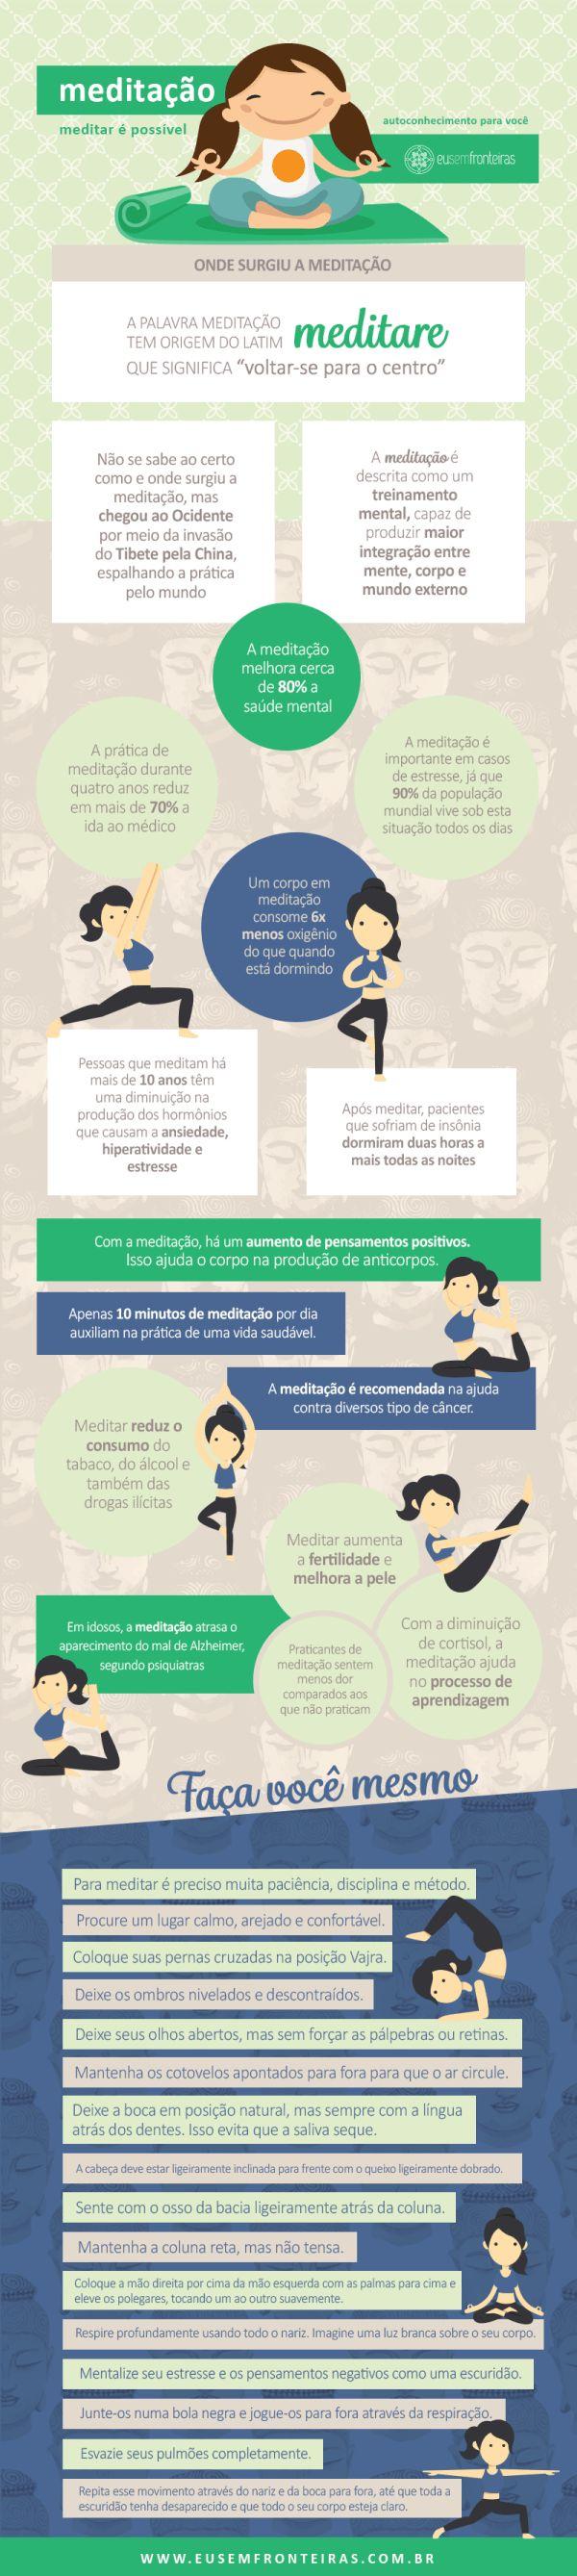 infografico-meditacao